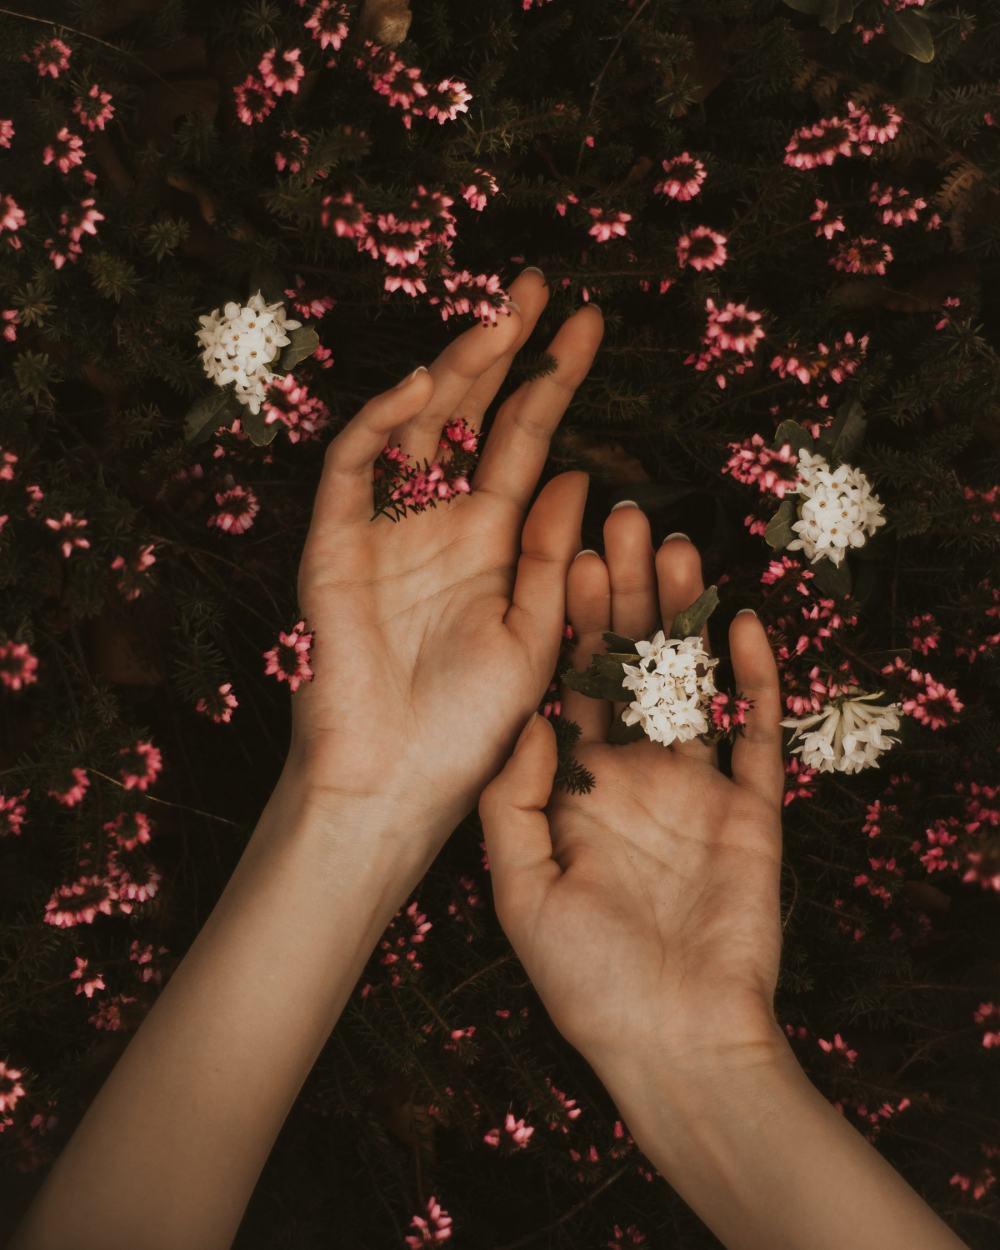 pair hands